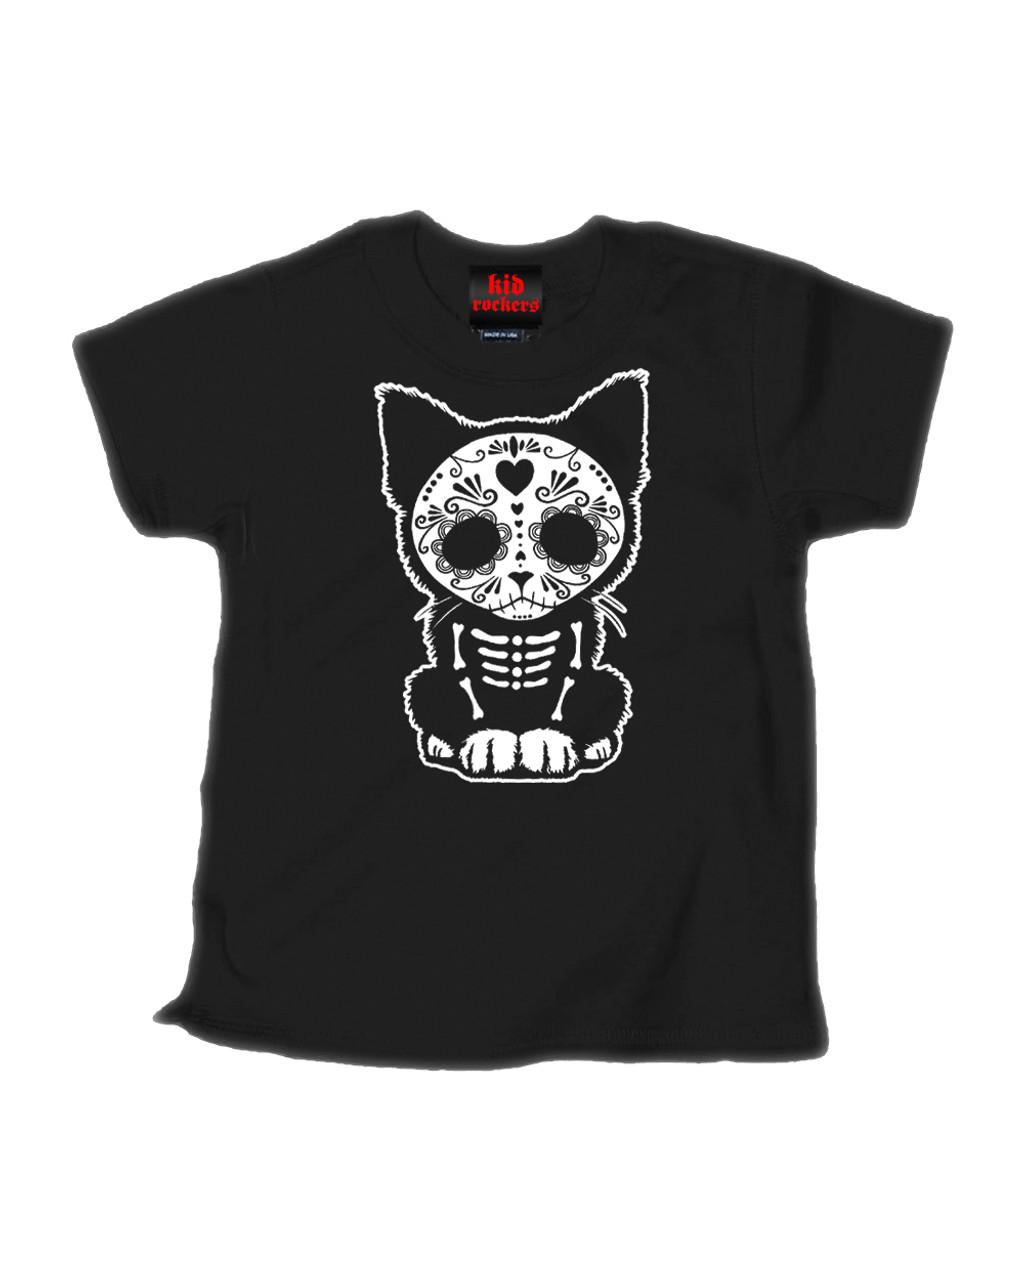 dafacec28c Day Of The Dead Sugar Skull Kitten Cat - Kid Rockers Children's Tee Shirt  Clothing (Black) - Aesop Originals